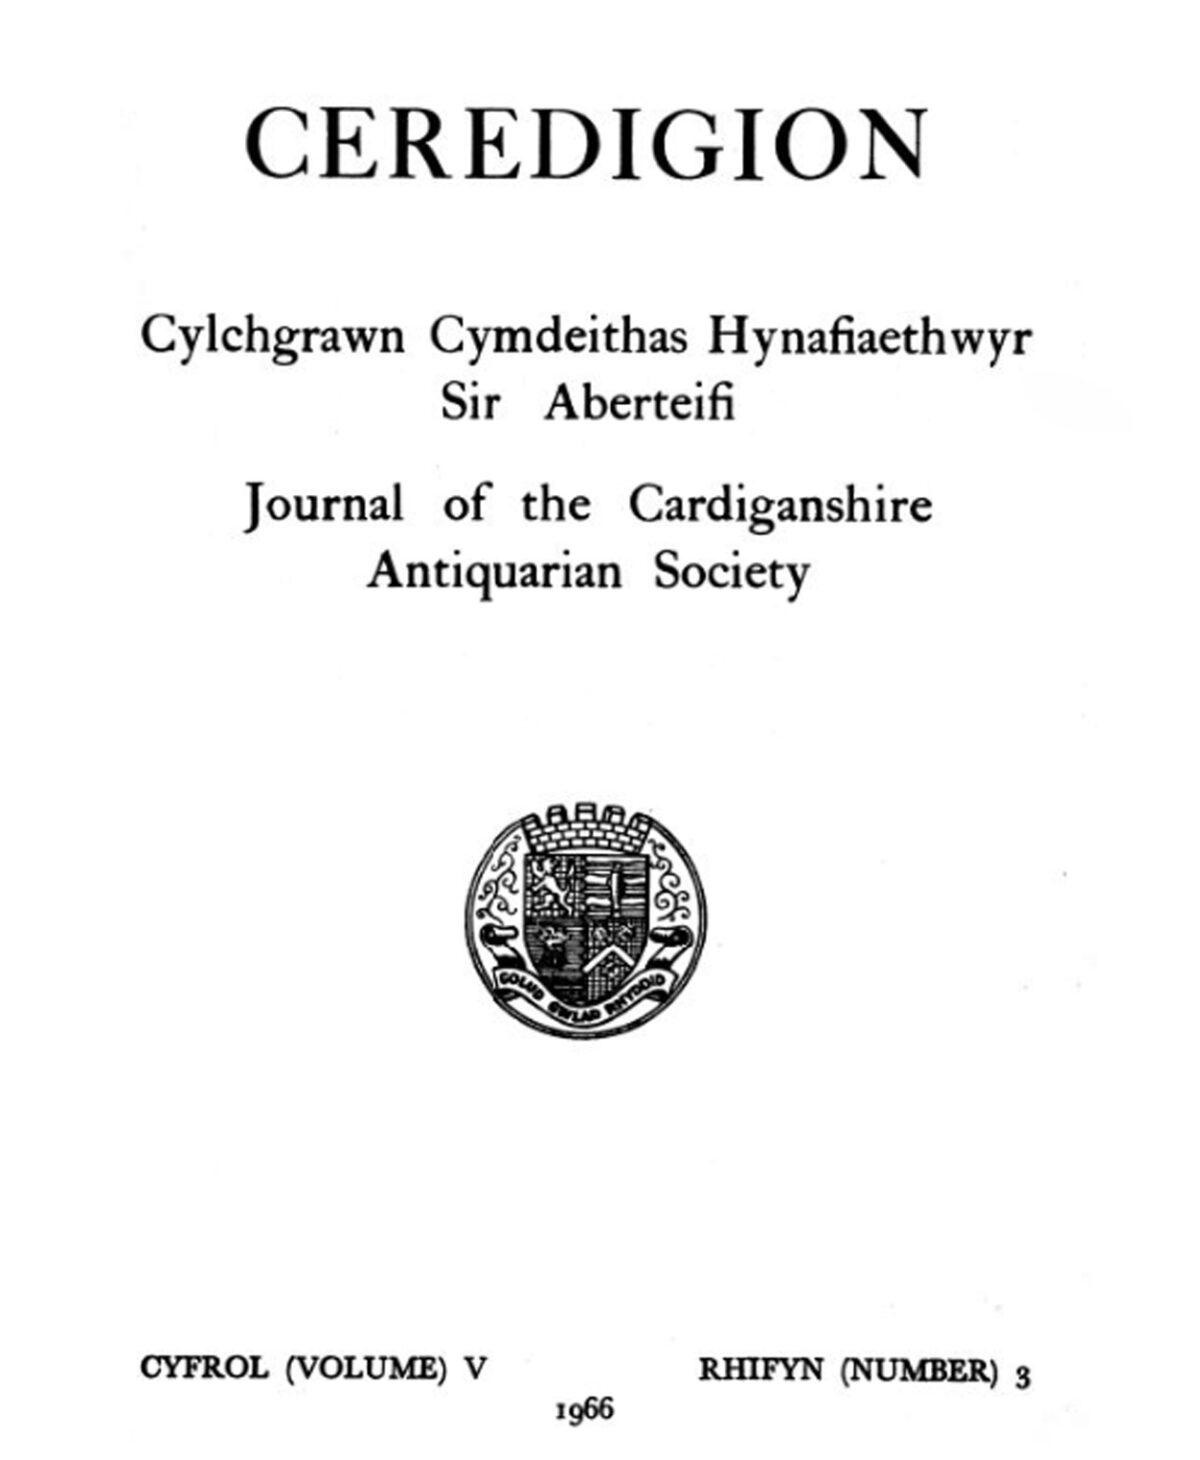 Ceredigion – Journal of the Cardiganshire Antiquarian Society, 1966 Vol V No 3